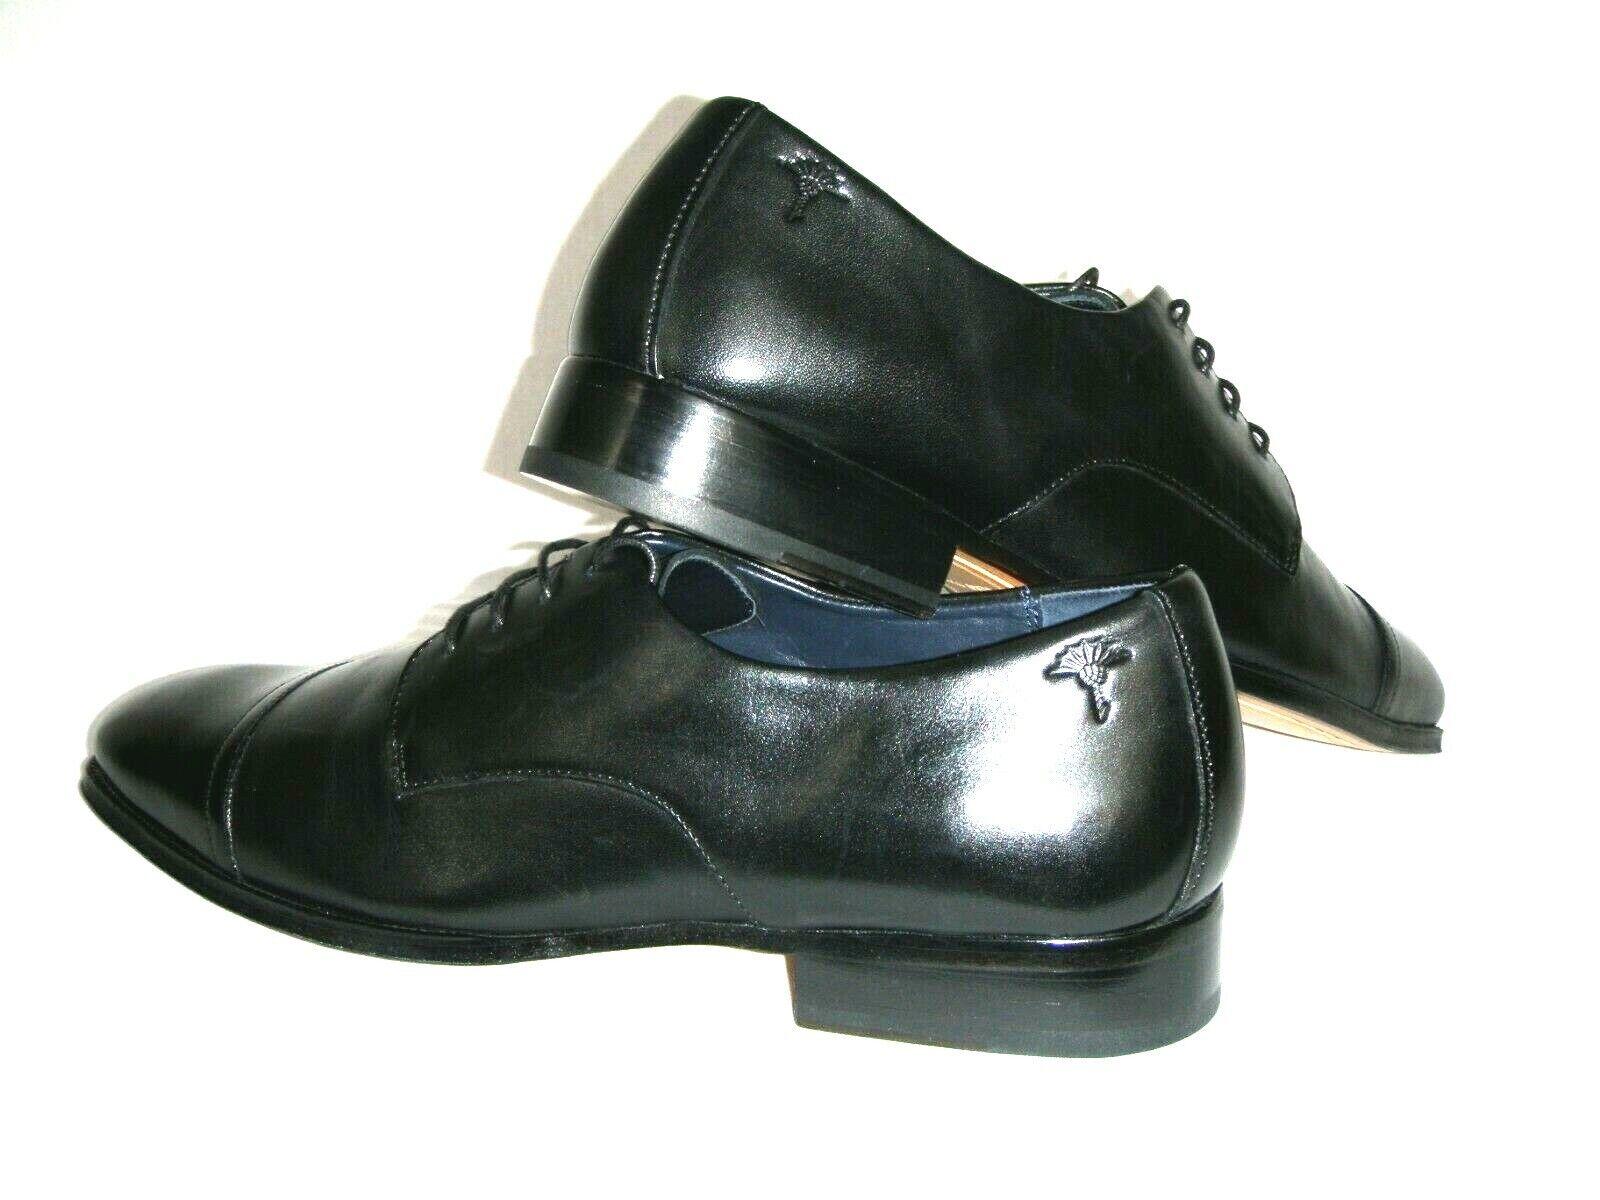 buy popular b679b d1059 Leder Herrenschuhe Freizeit Business JOOP Elegante Schuhe ...